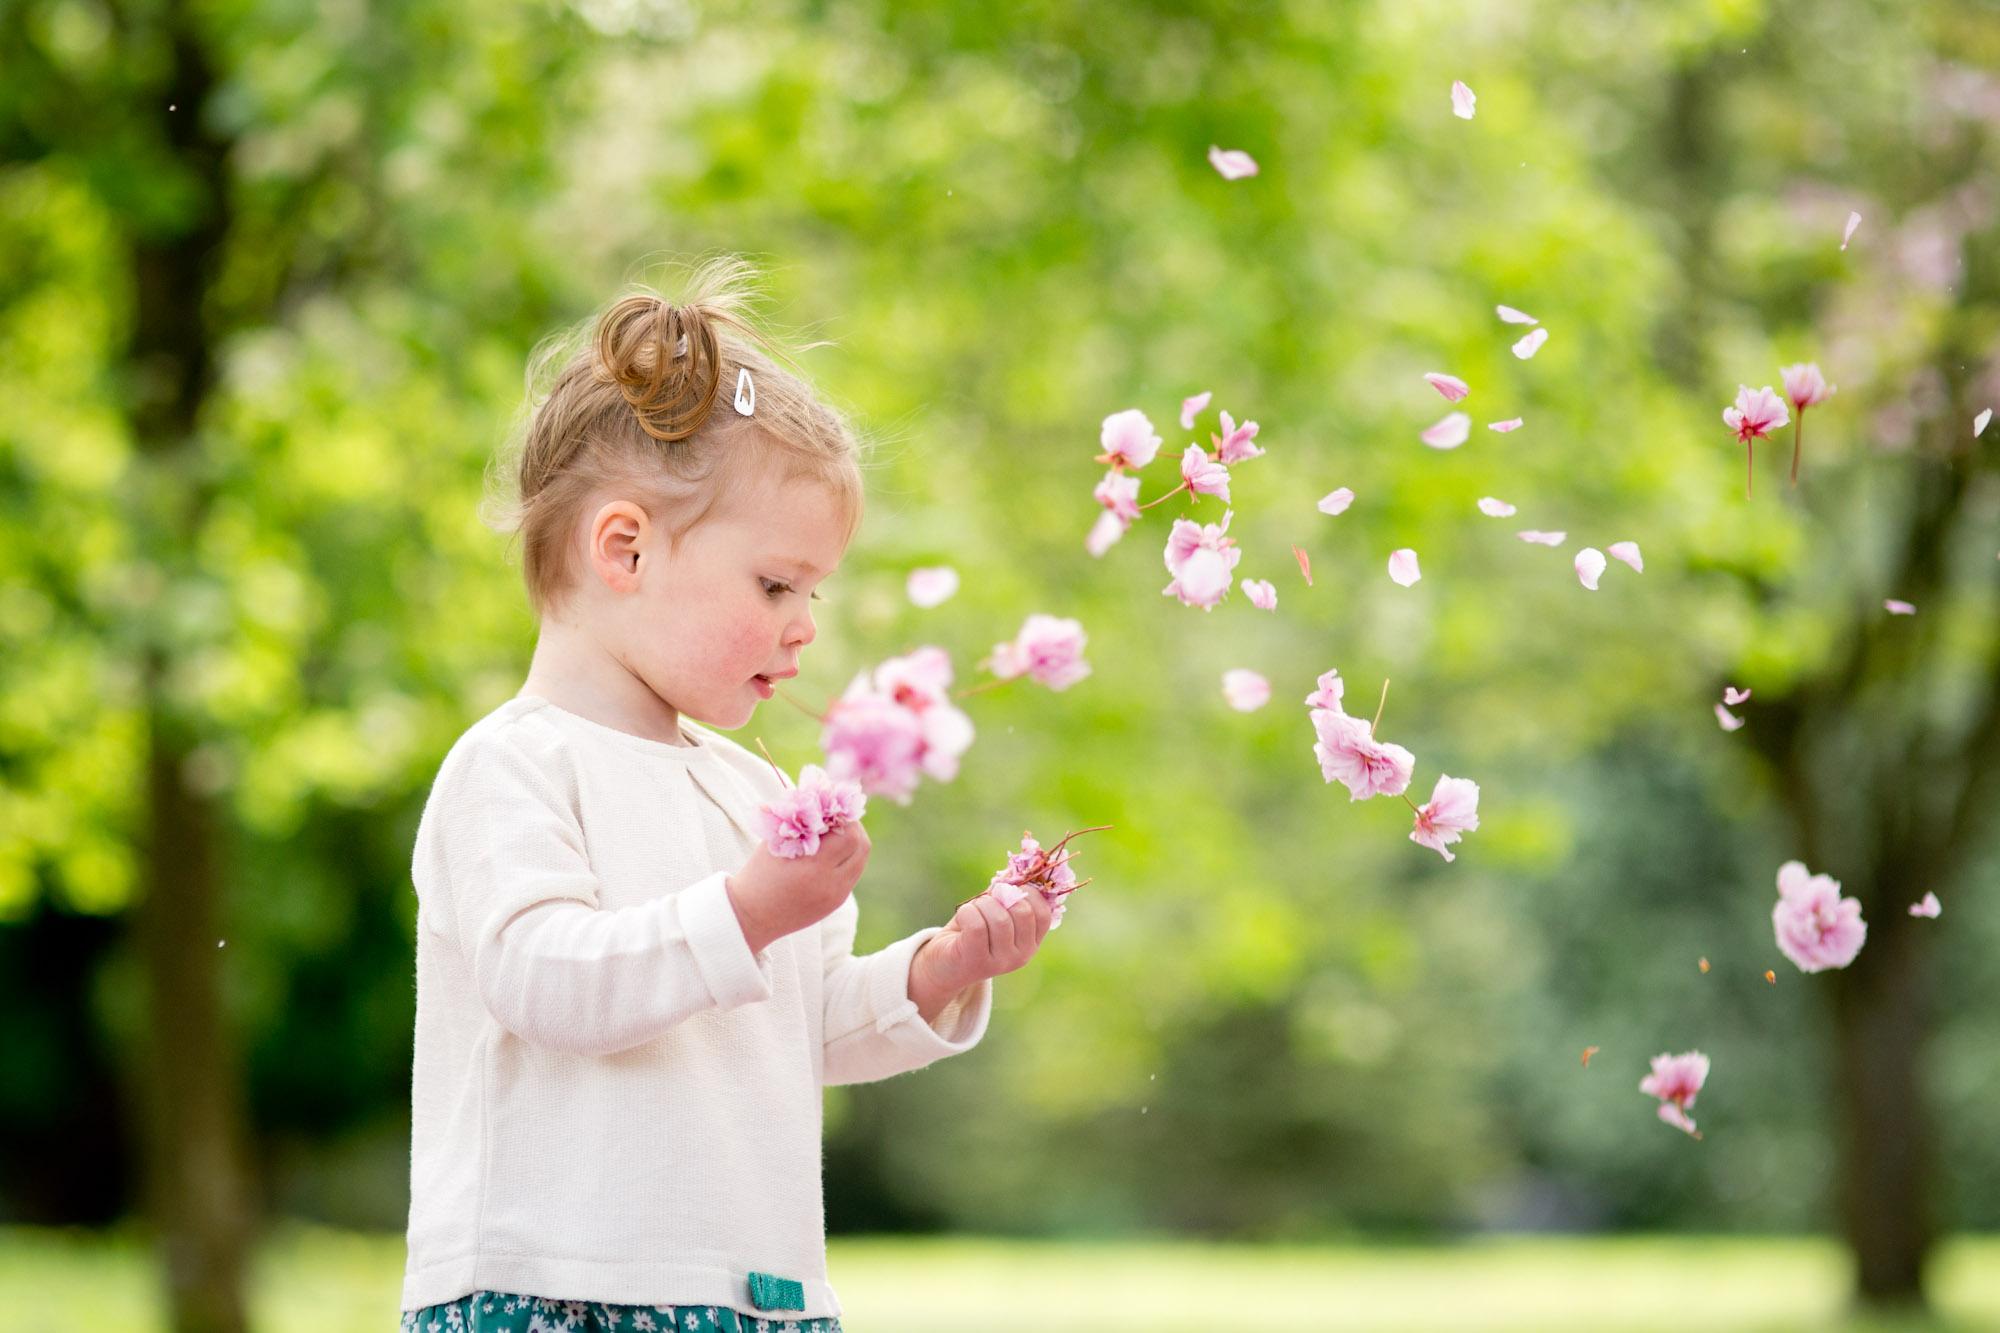 family-portrait-photography-spring-blossom-13.jpg